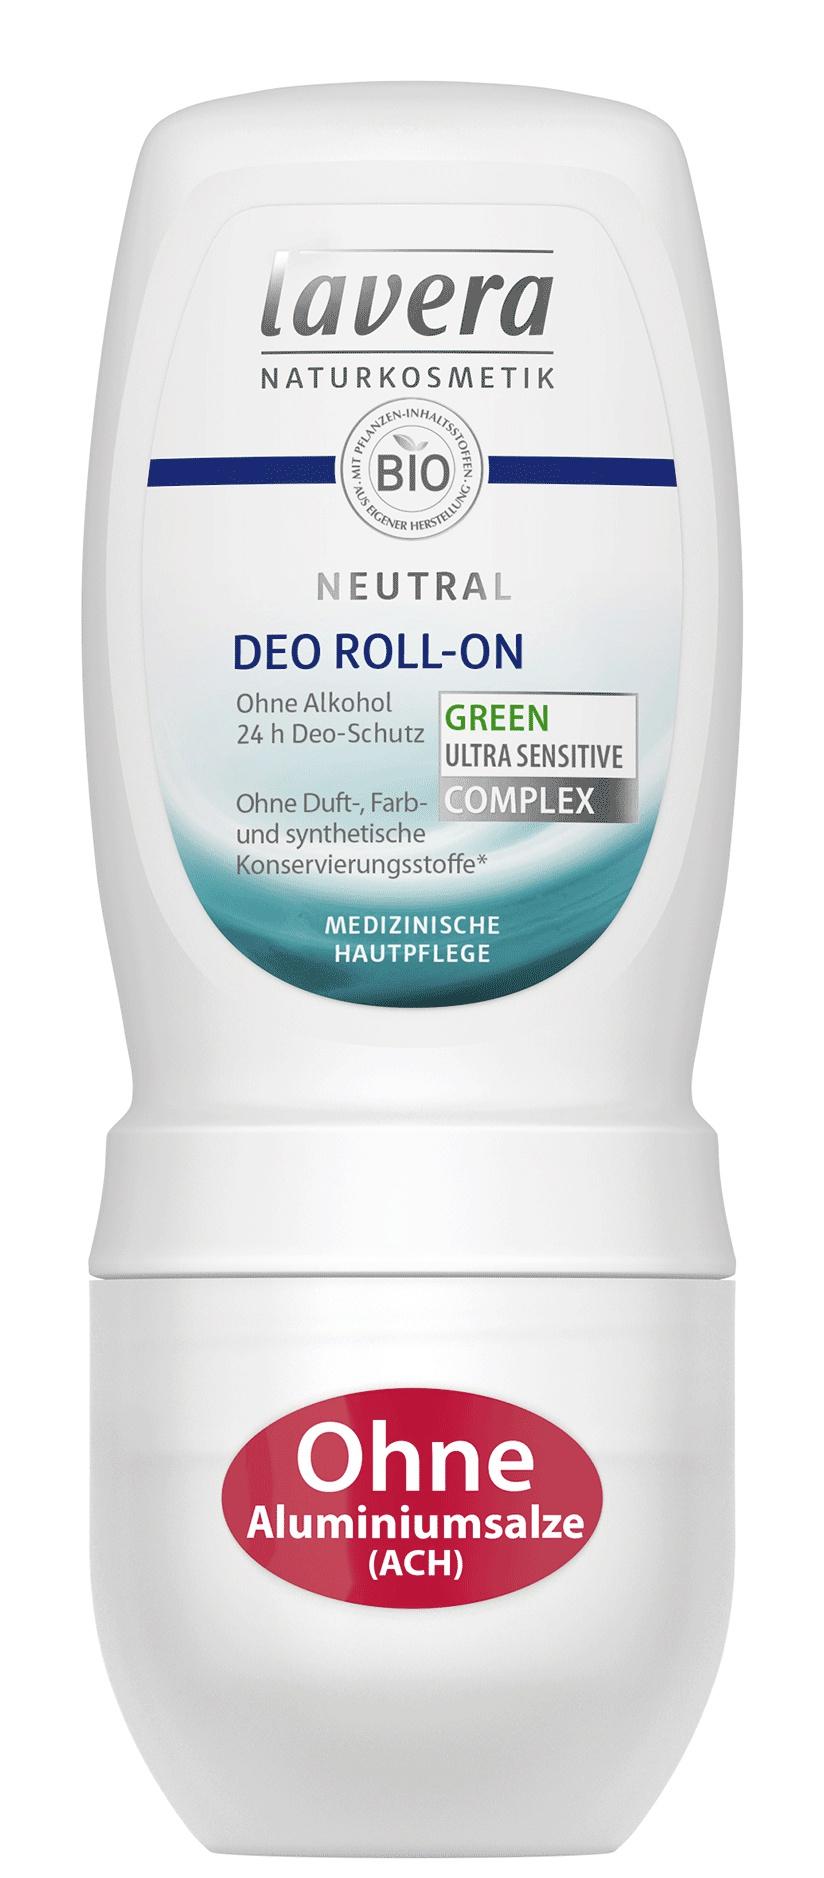 lavera Neutral Deo Roll-on Ultra Sensitive